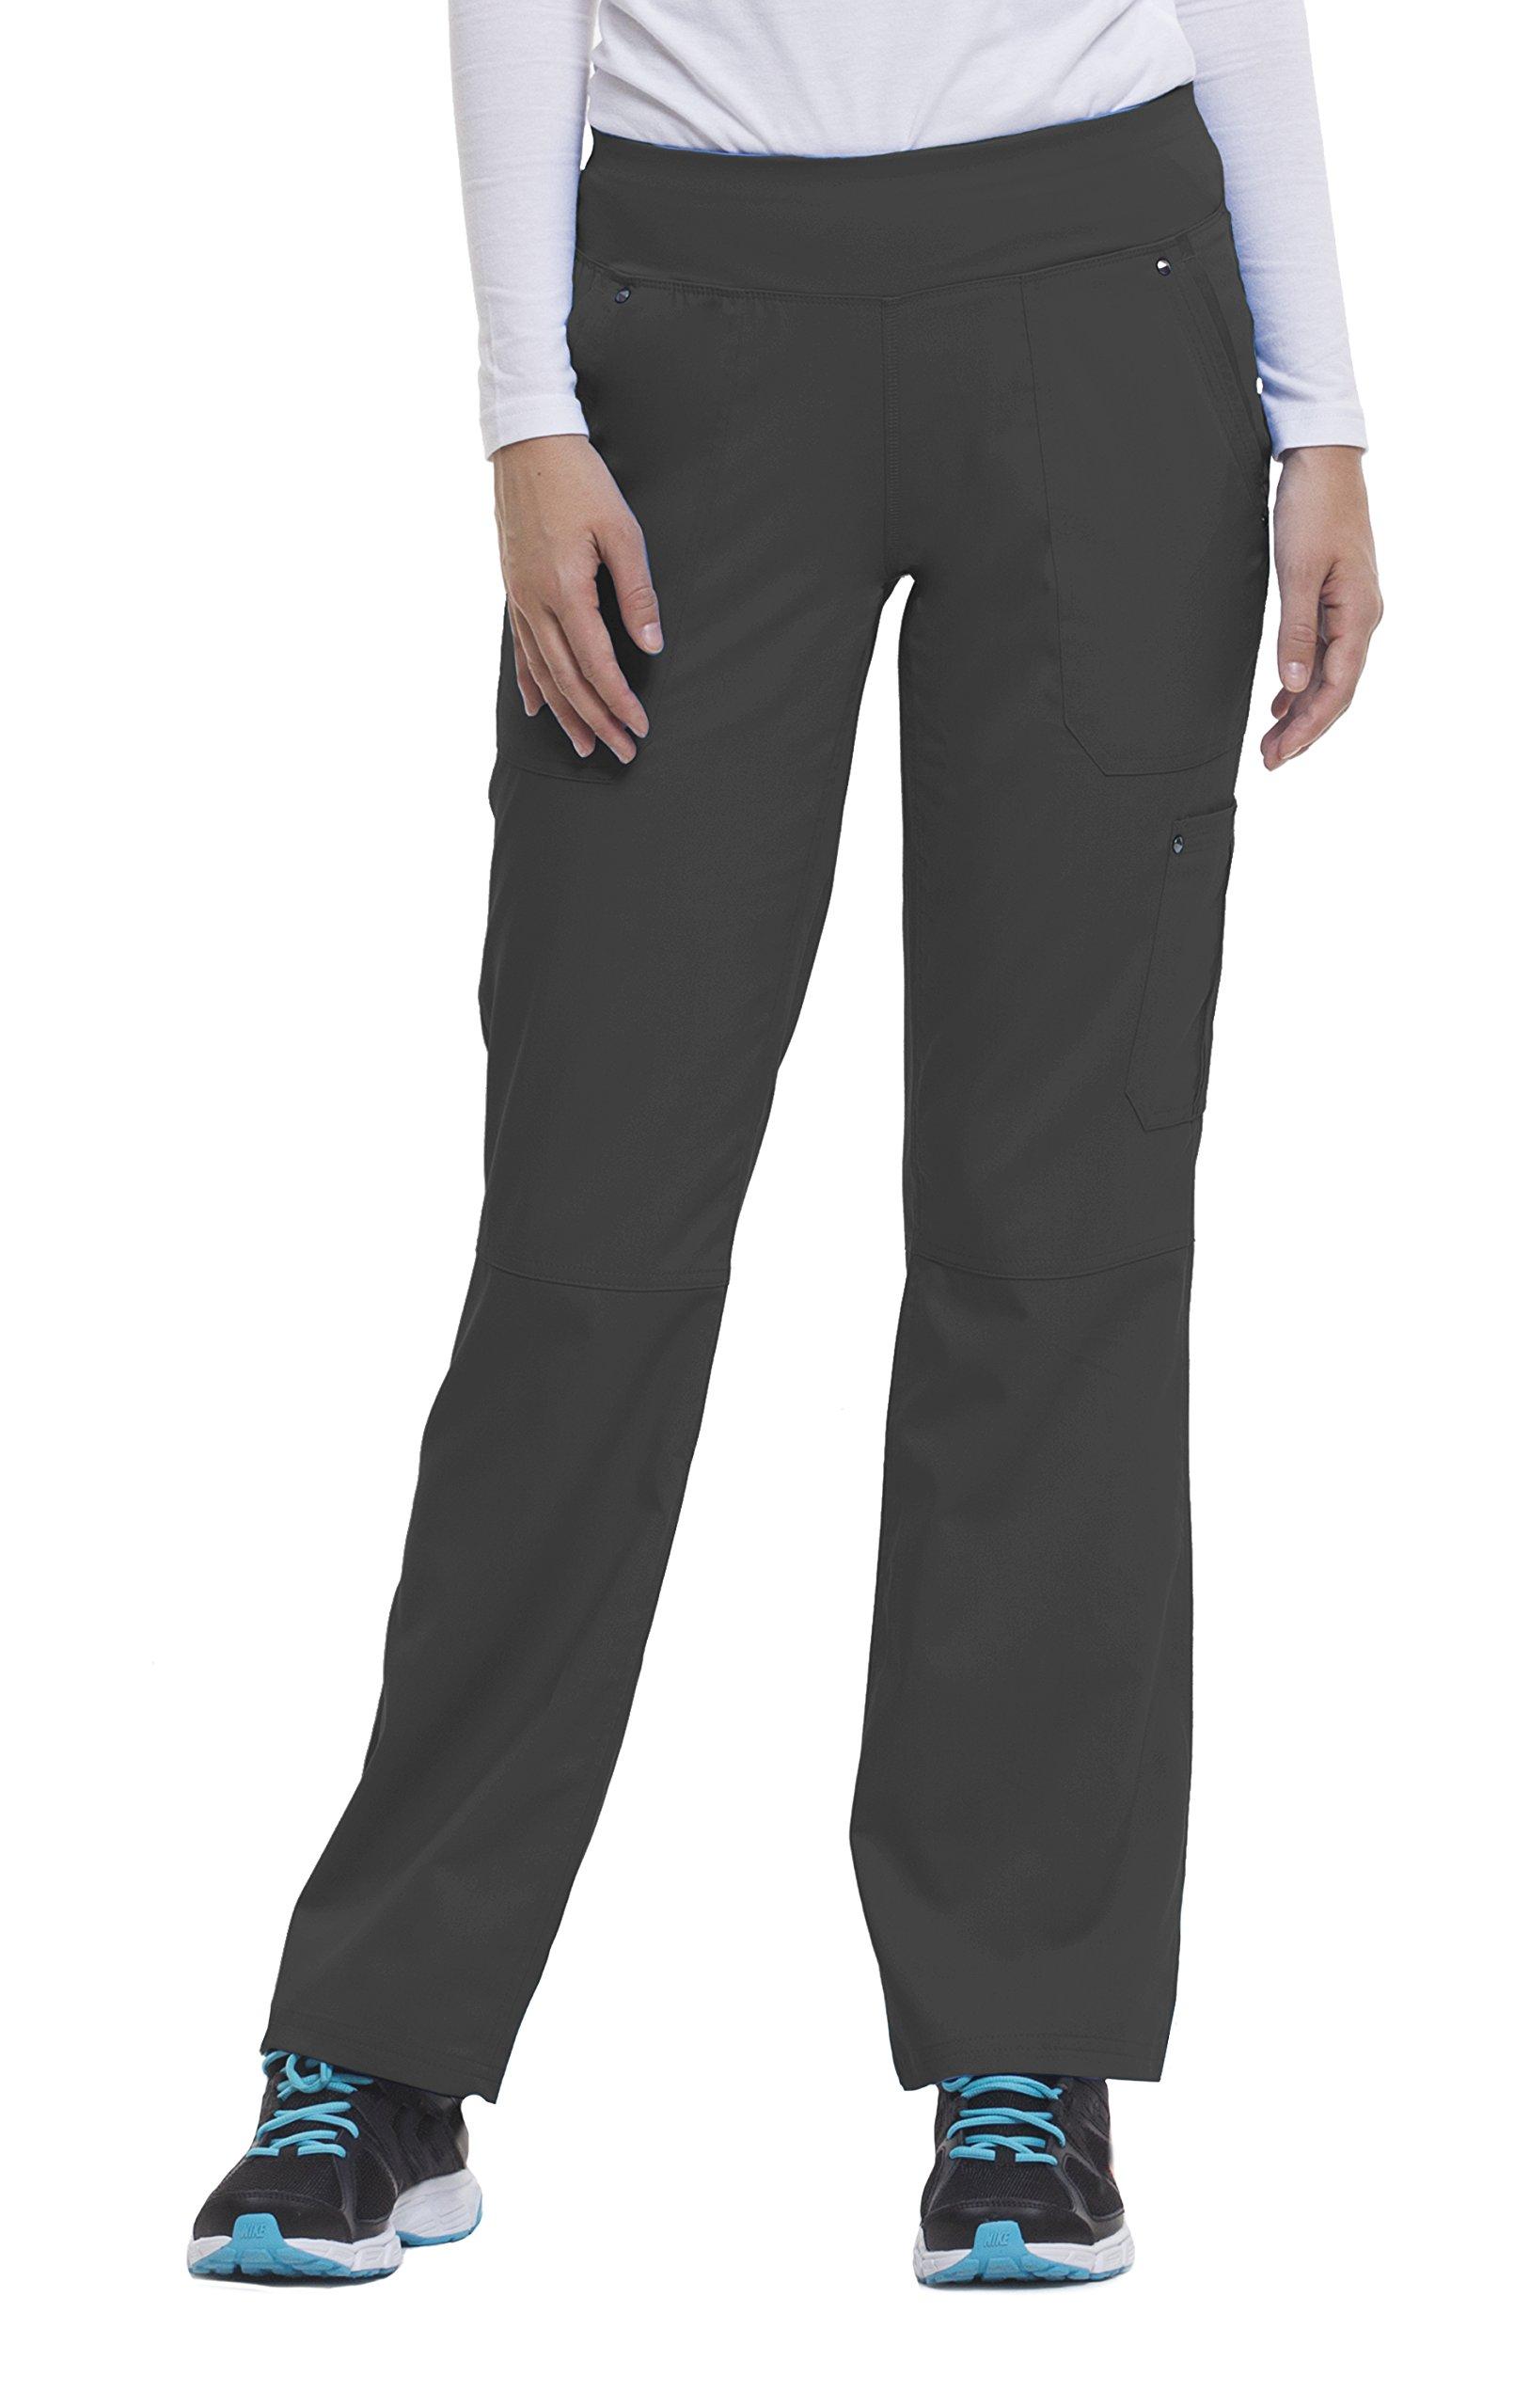 4424ee5672c59 healing hands Purple Label Yoga Women s Tori 9133 5 Pocket Knit Waist Pant